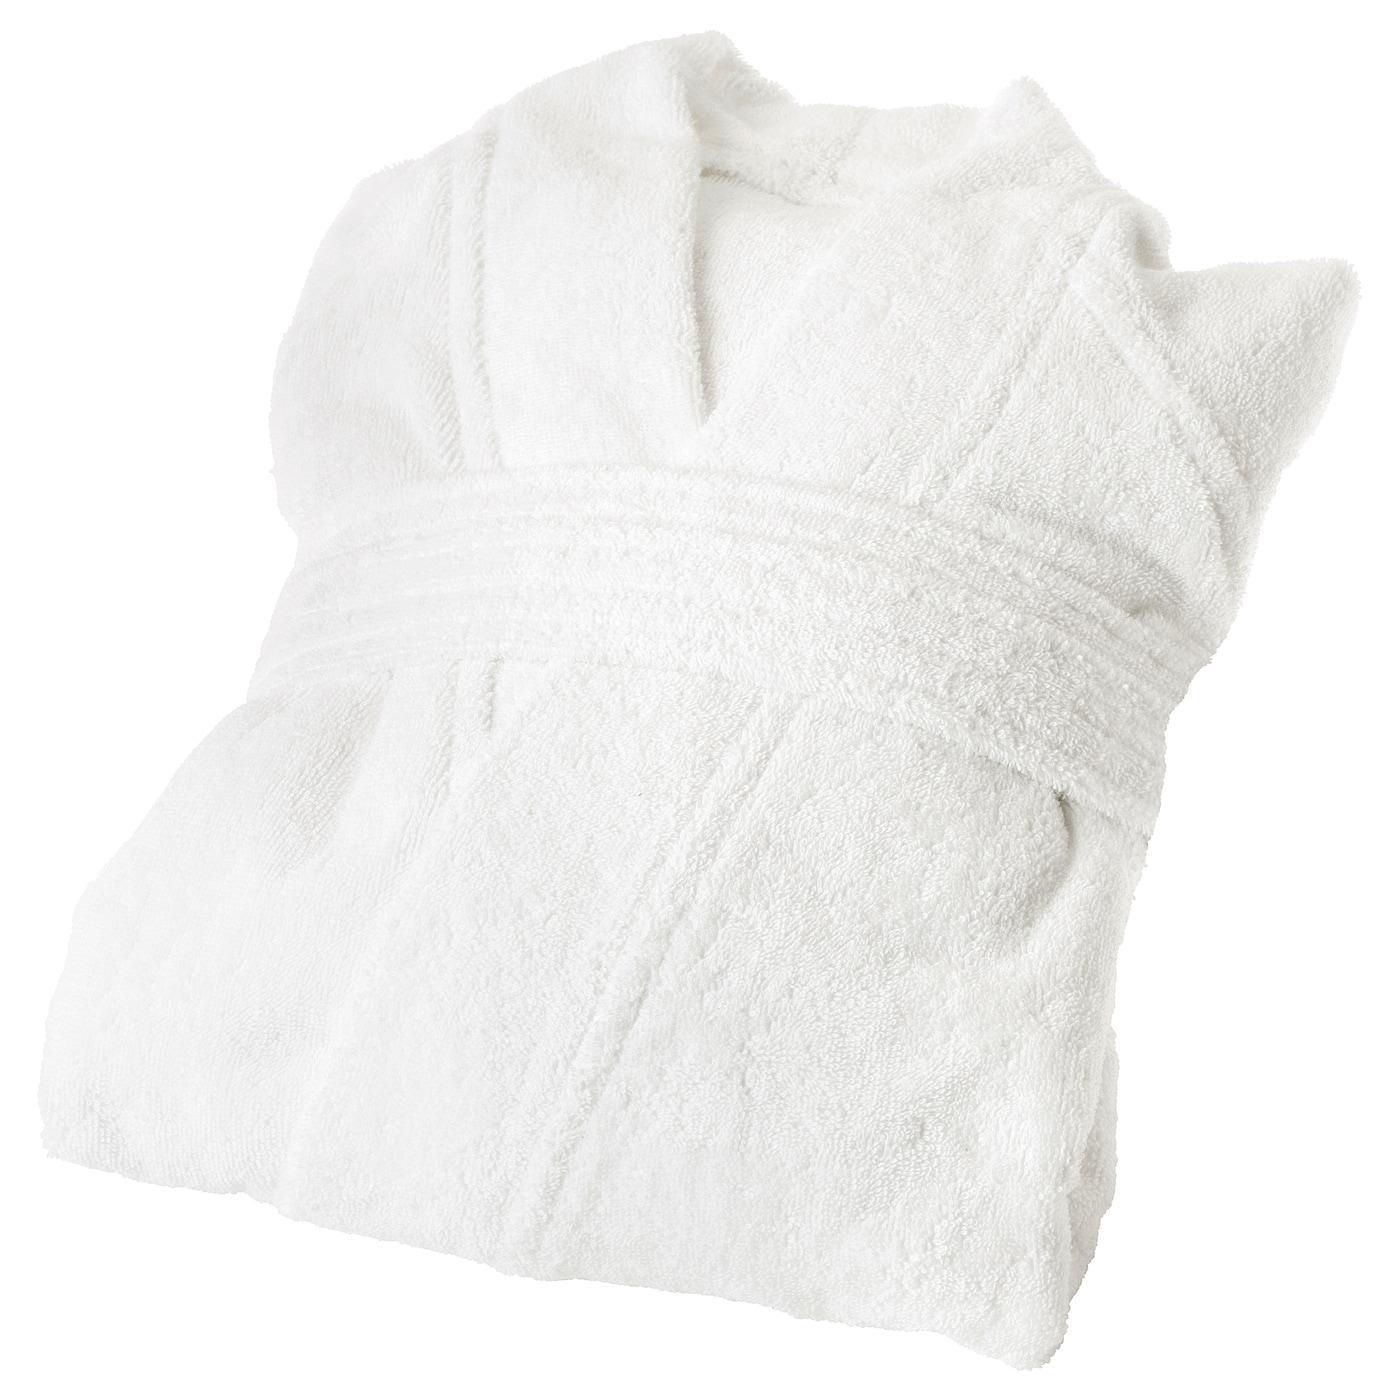 stugvik porte serviette ventouse blanc ikea. Black Bedroom Furniture Sets. Home Design Ideas